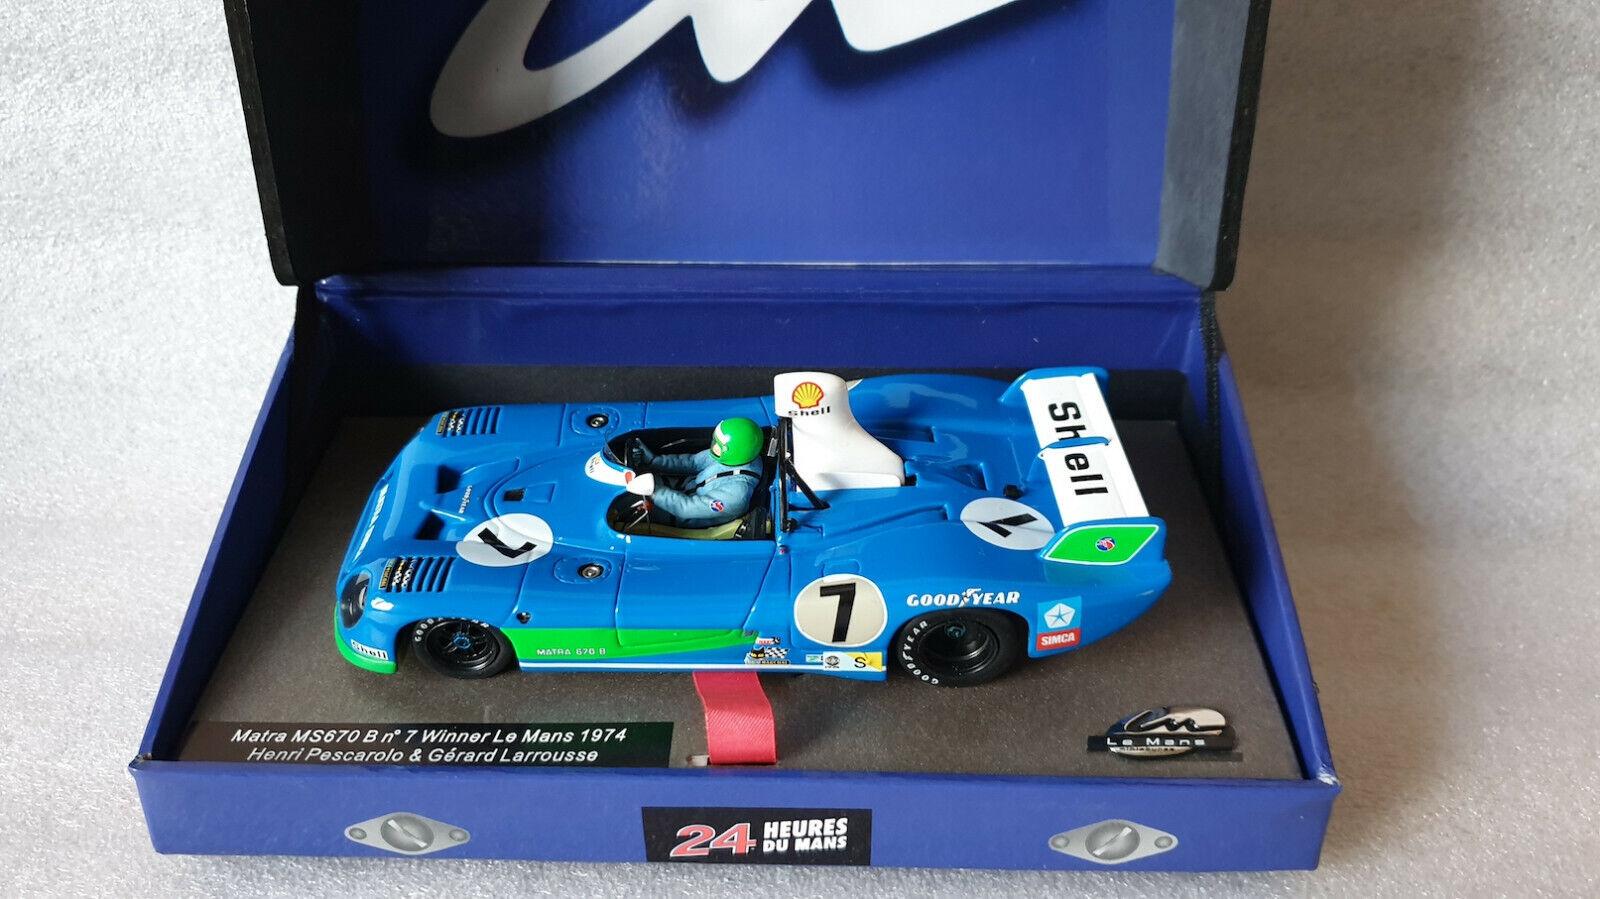 LMM Le Mans Miniatures 132018 7M MATRA MS670 B  7 winner Le Mans 1974 NIB